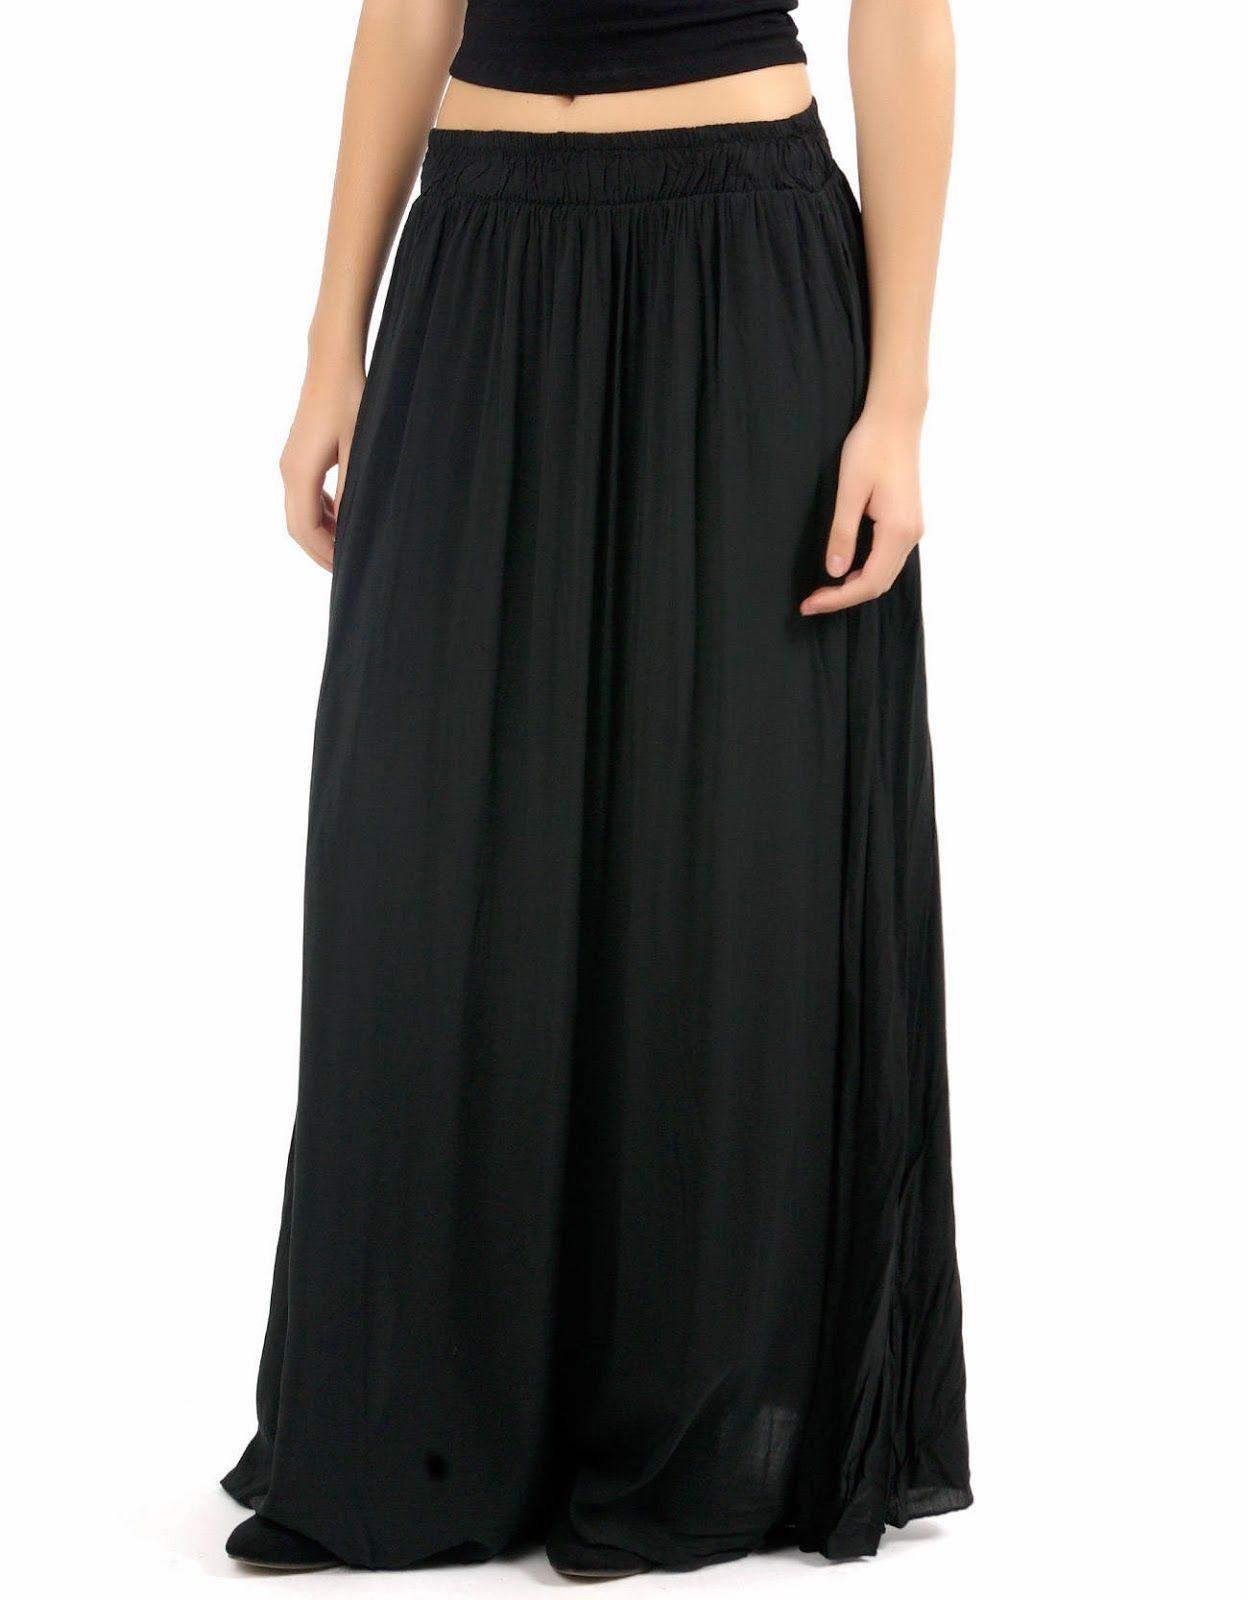 6be7a212c Modelos de faldas negras largas  faldas  largas  modelos  modelosdeFalda   negras